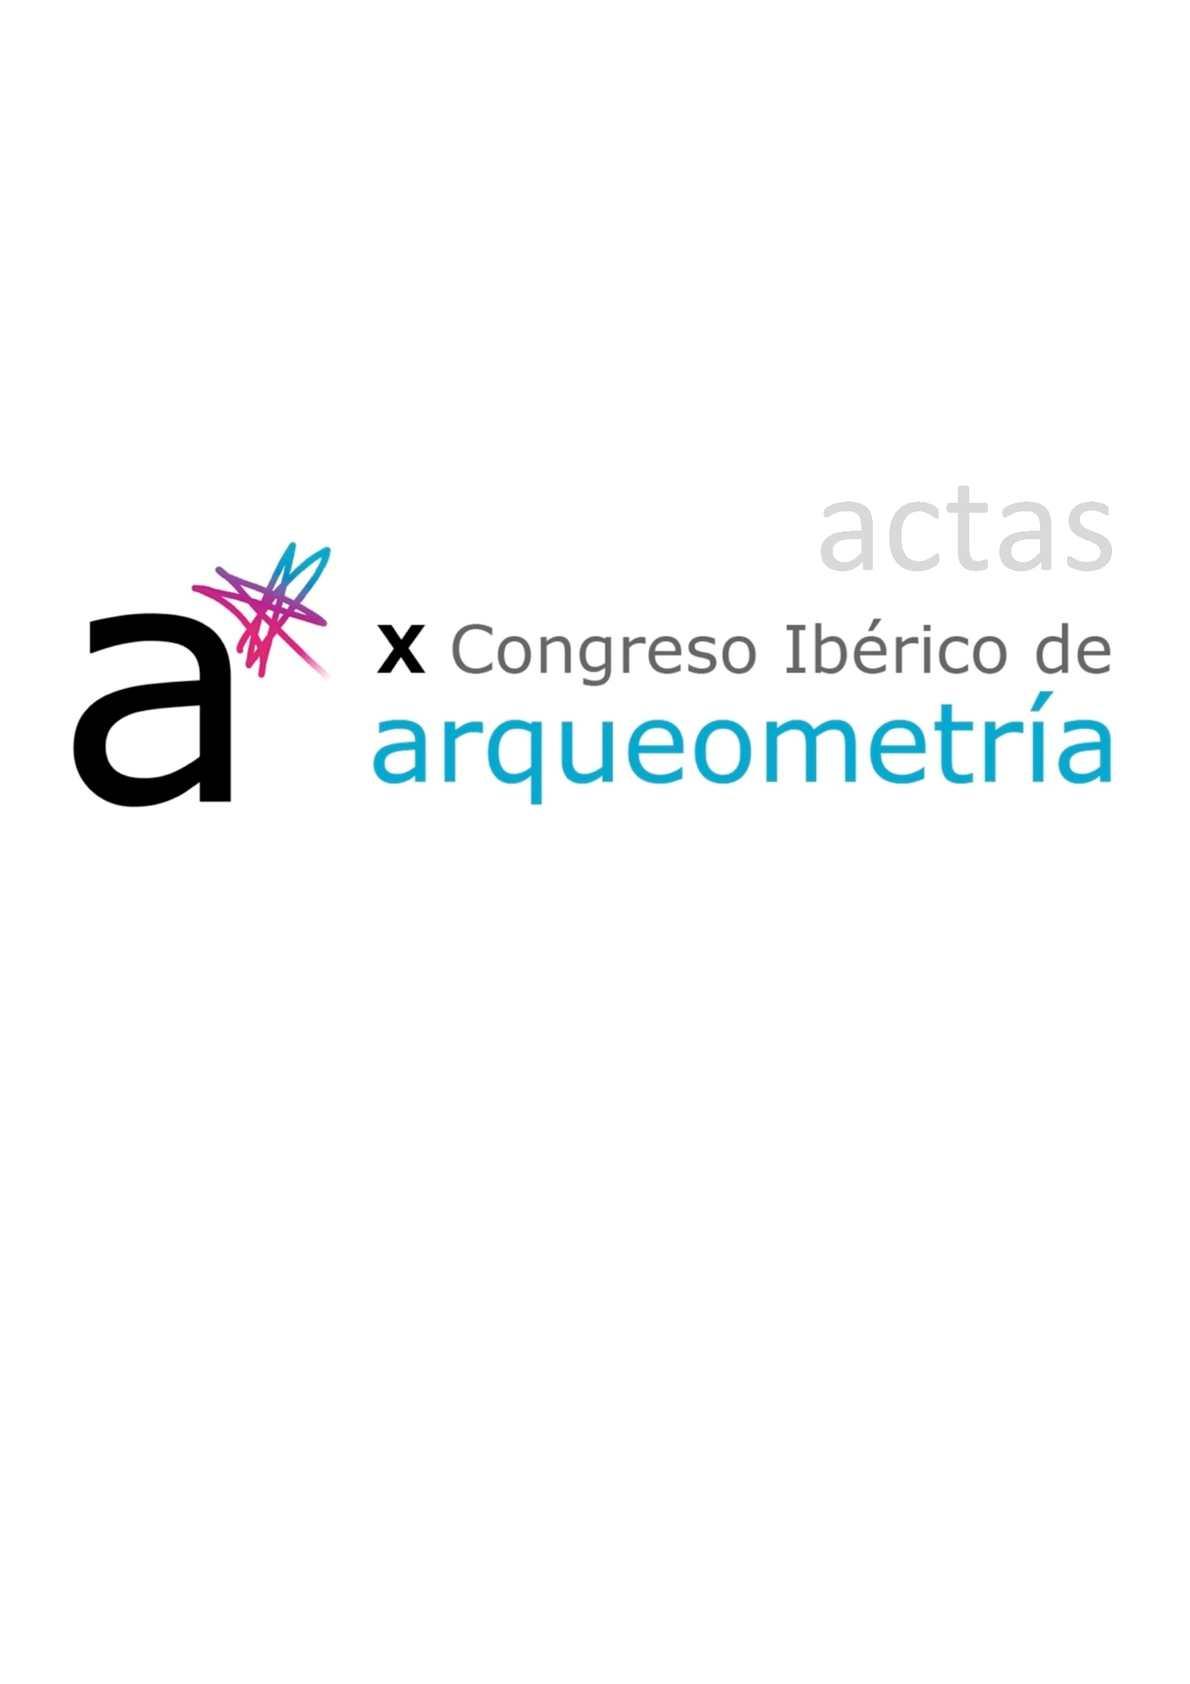 e2f3b037055c Calaméo - Actas del X Congreso Ibérico de Arqueometría